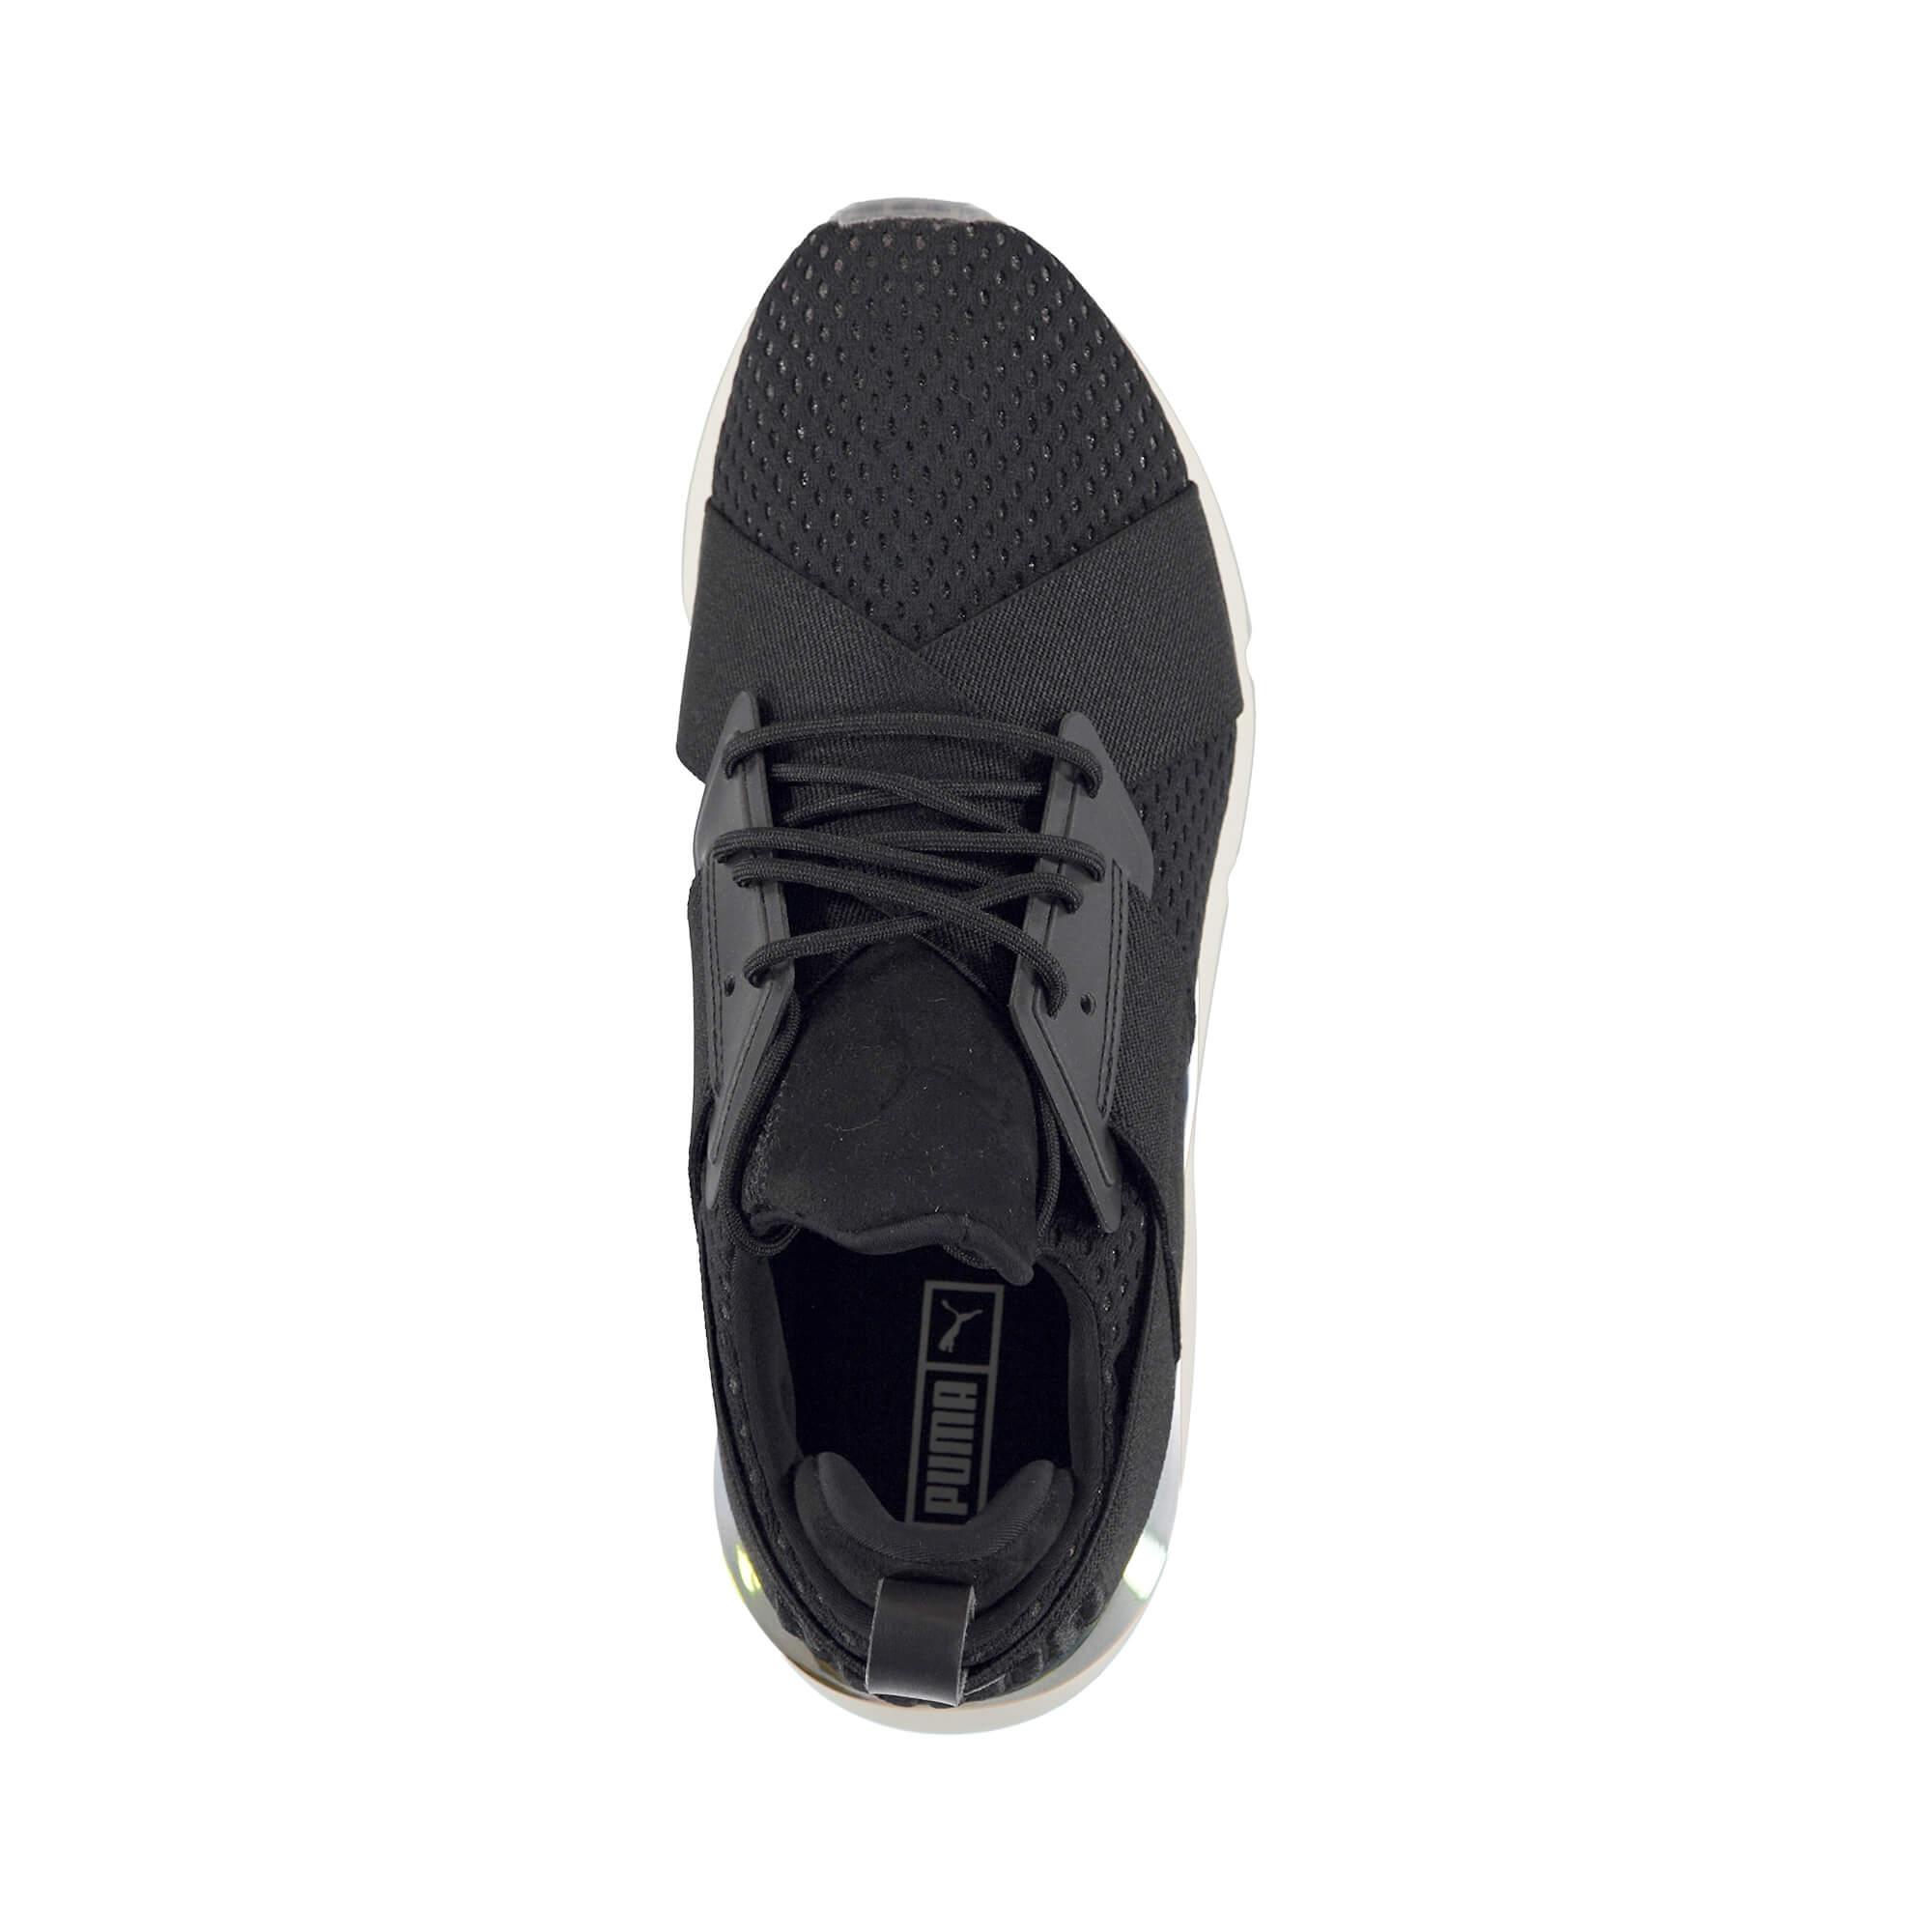 Puma Muse Dirt Bikes Kadın Siyah Sneaker